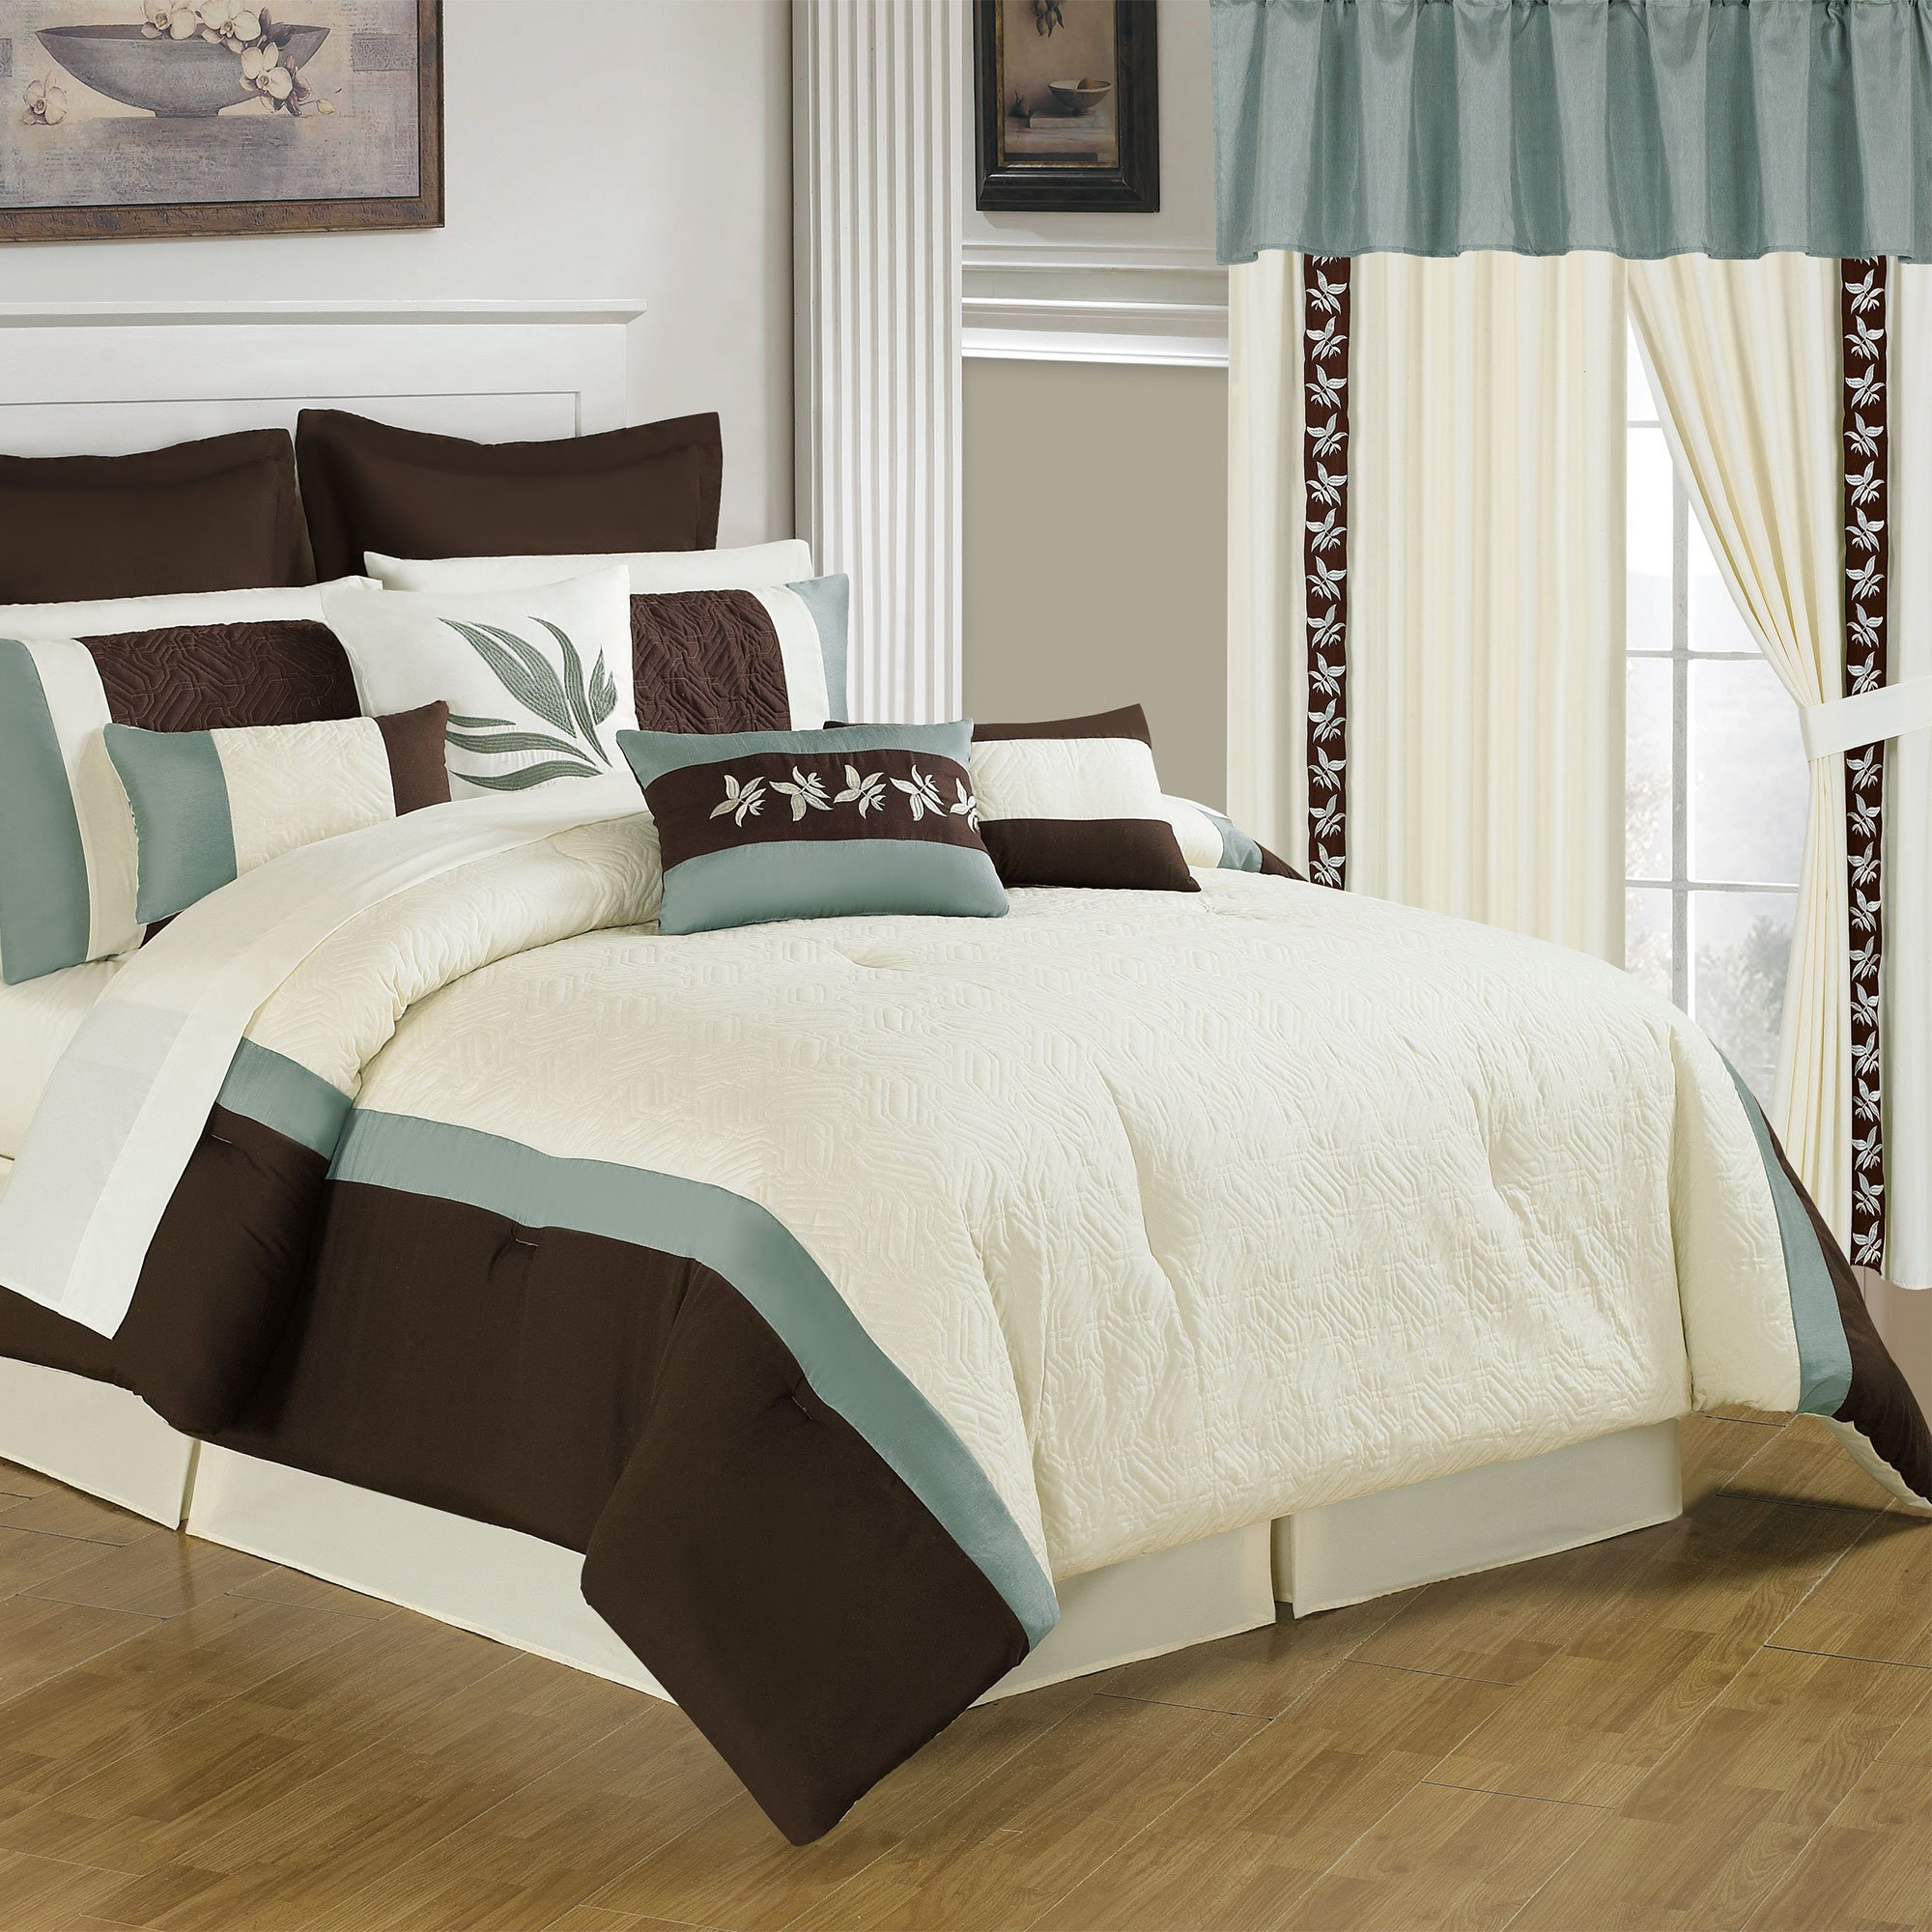 Lavish Home 66-00010-24pc-K 25-Piece Room-in-a-Bag Anna Bedroom Set, King